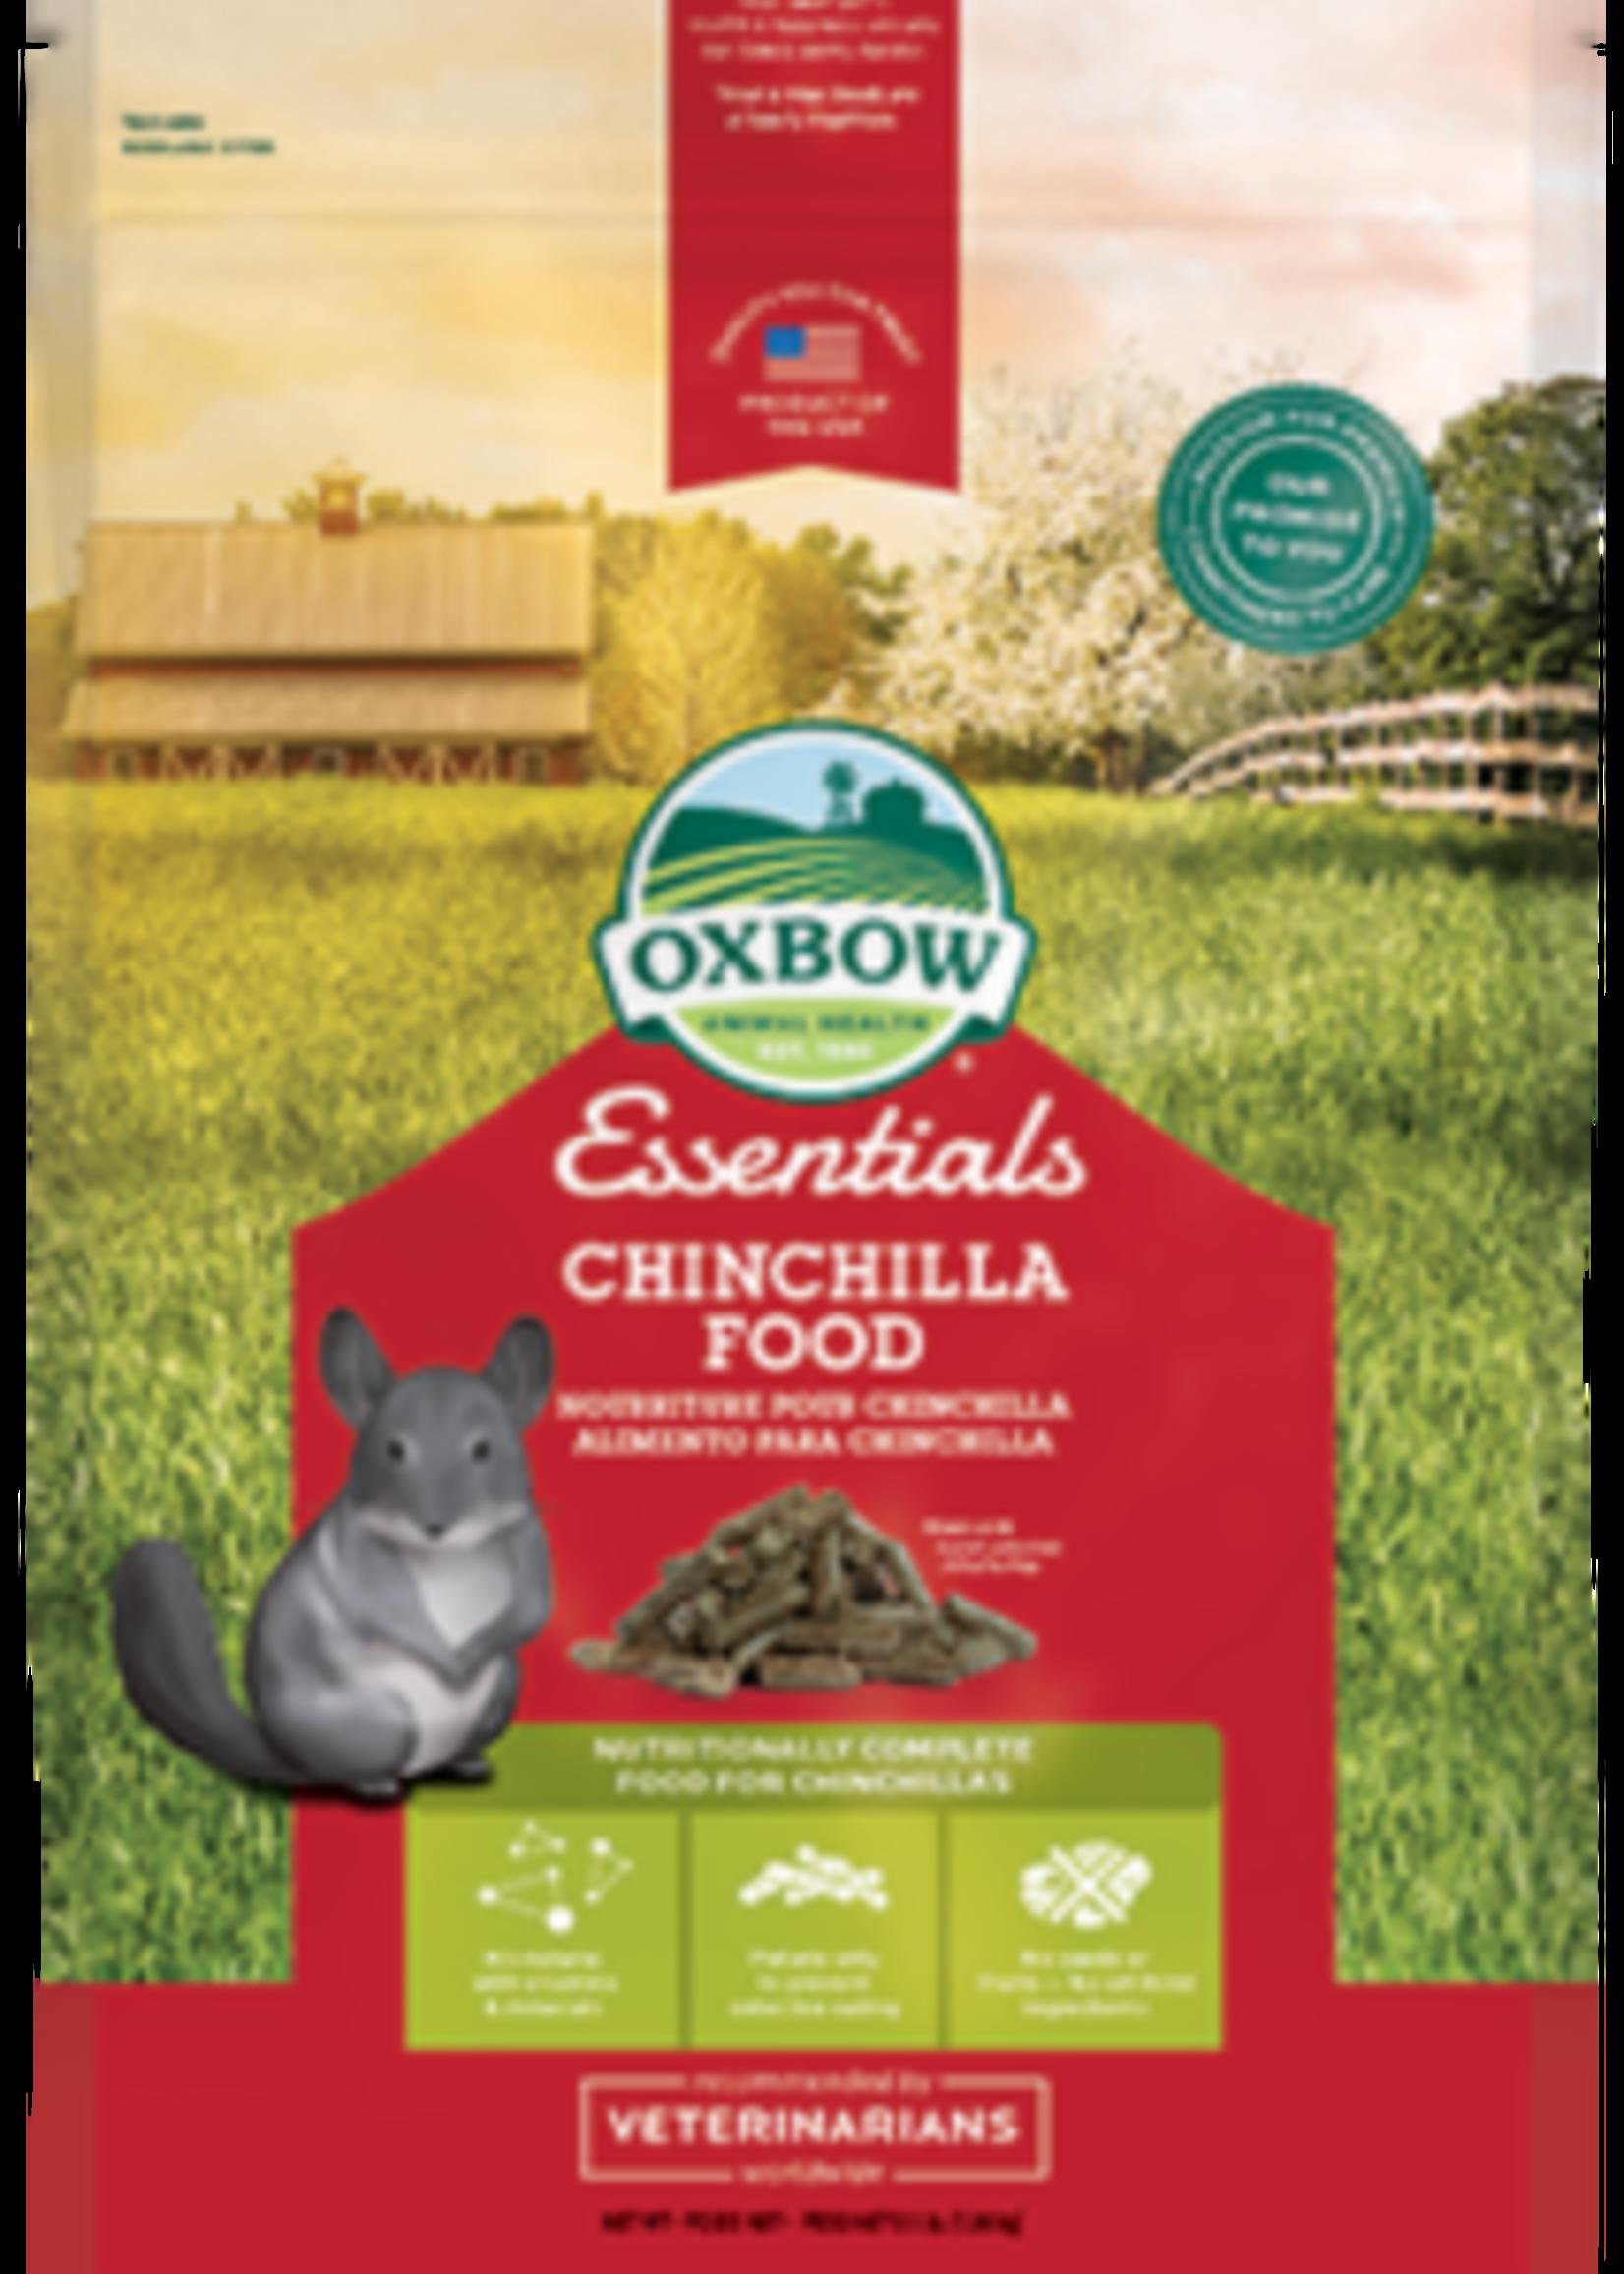 Oxbow Animal Health™ Oxbow Essentials Chinchilla Food 25lbs